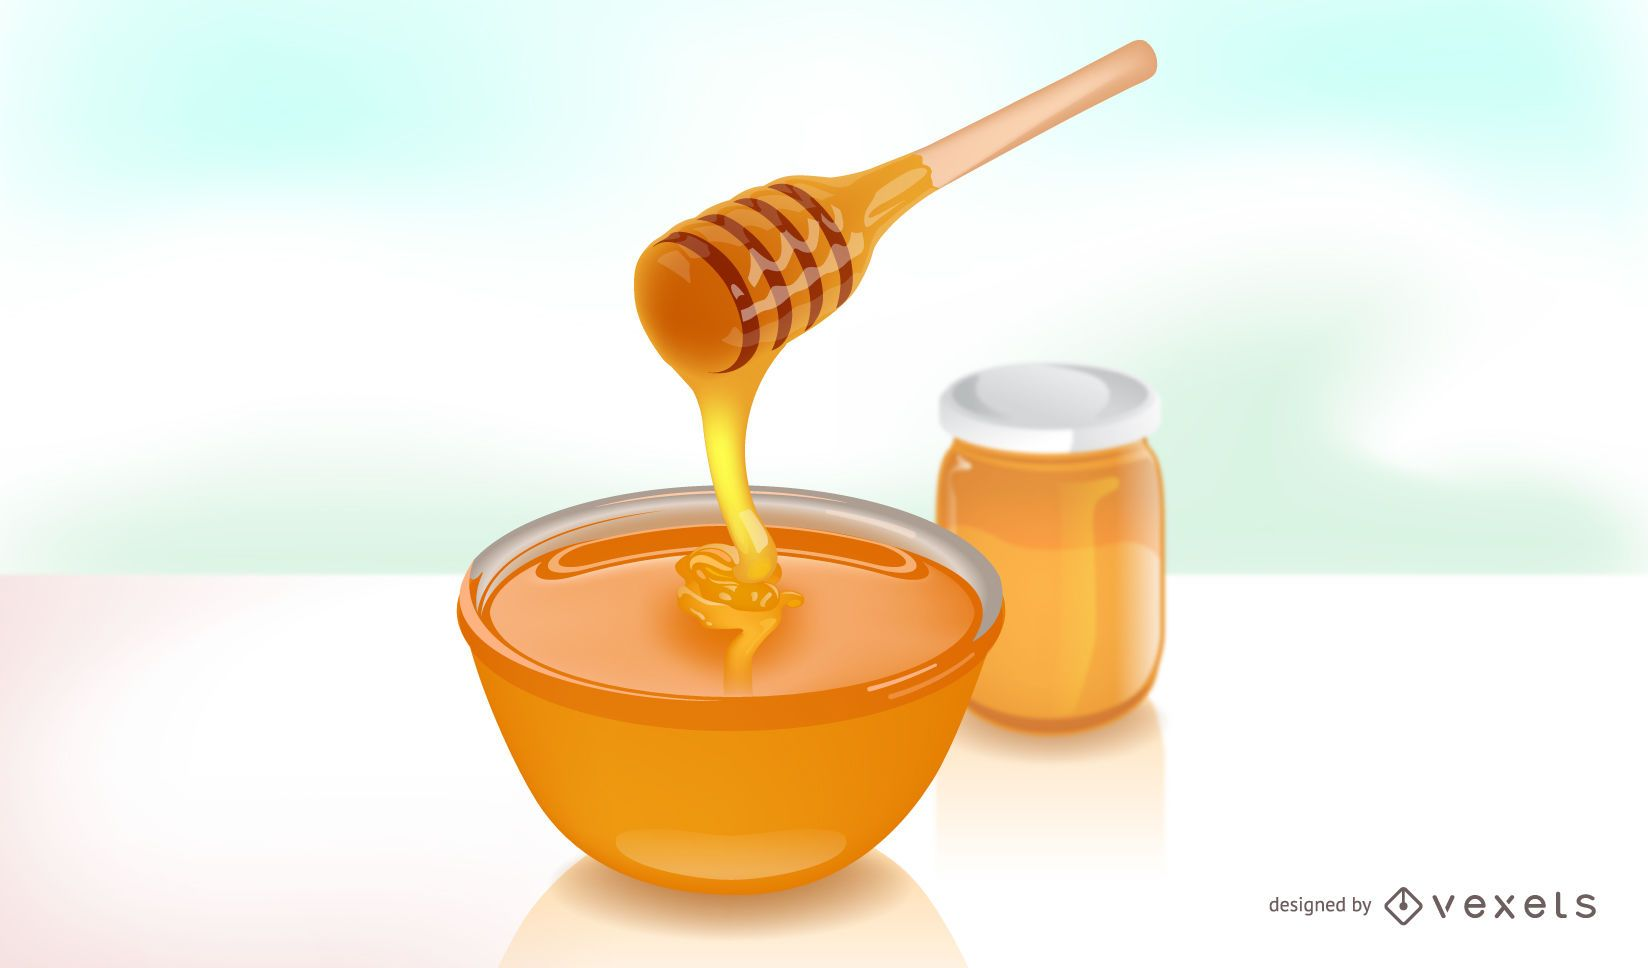 Realistic honey pouring illustration